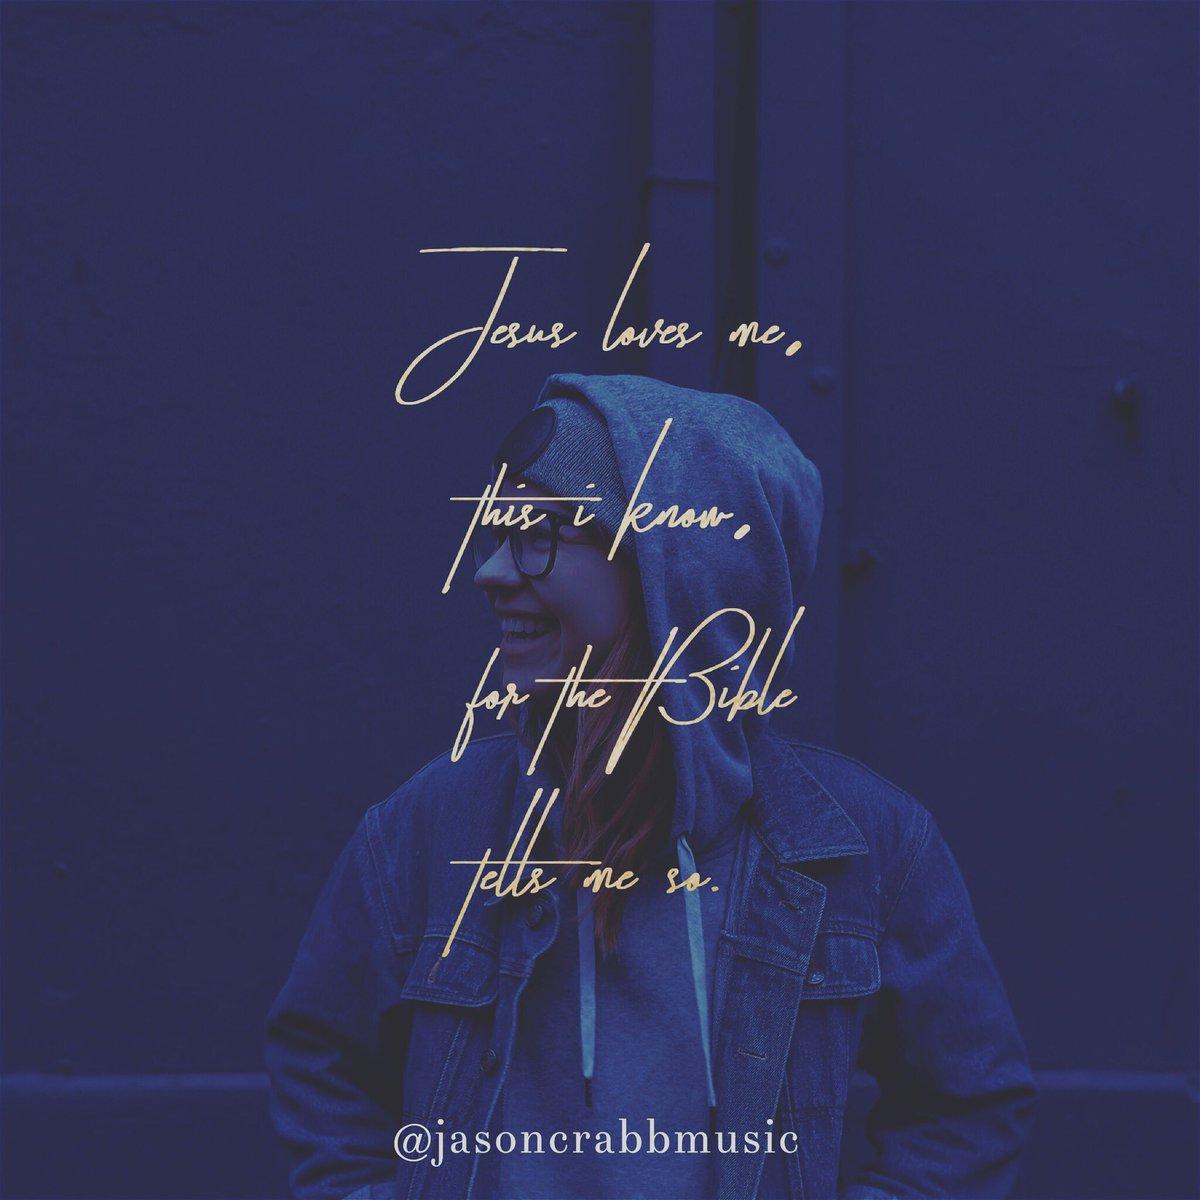 Yes, Jesus loves me! #jesus #love #wednesdaywisdom #wednesday #wednesdaymotivation #truth #bible